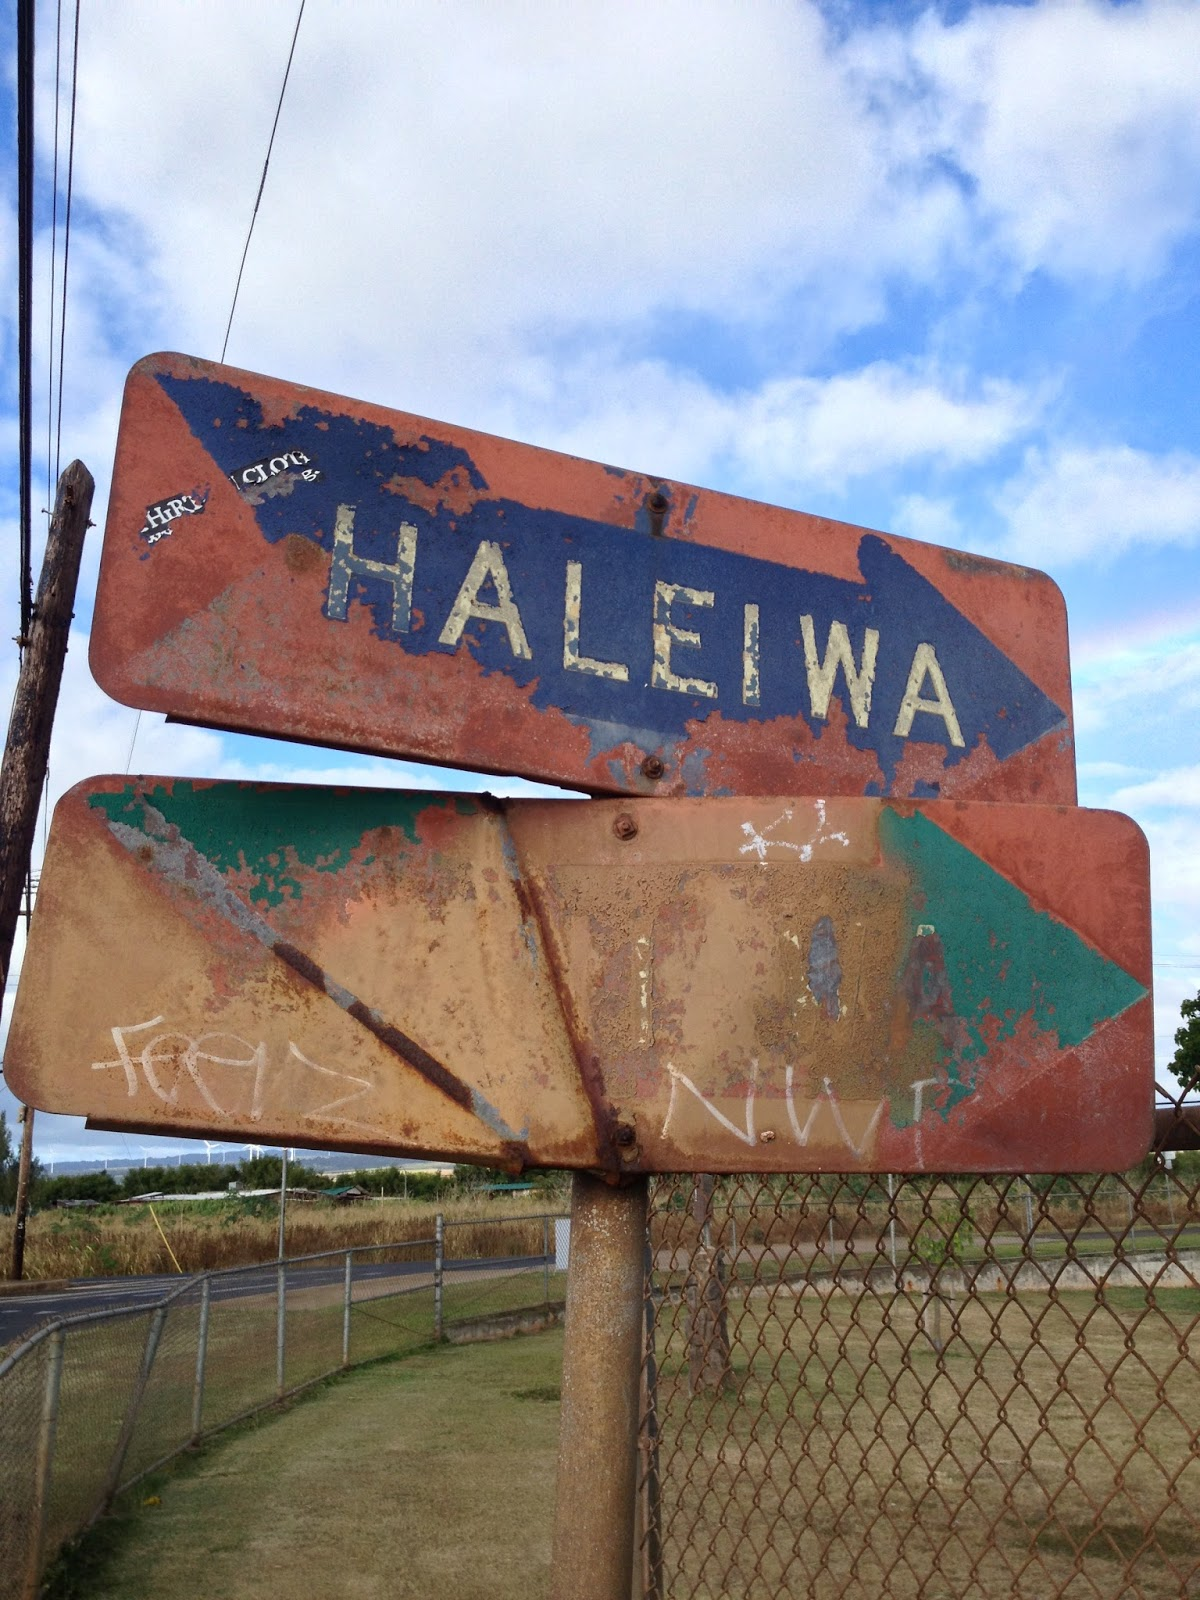 Appliances Data Haleiwa Surf Unit 102 Filter Queen Wiring Diagram Http Wwwsearspartsdirectcom Welcome To